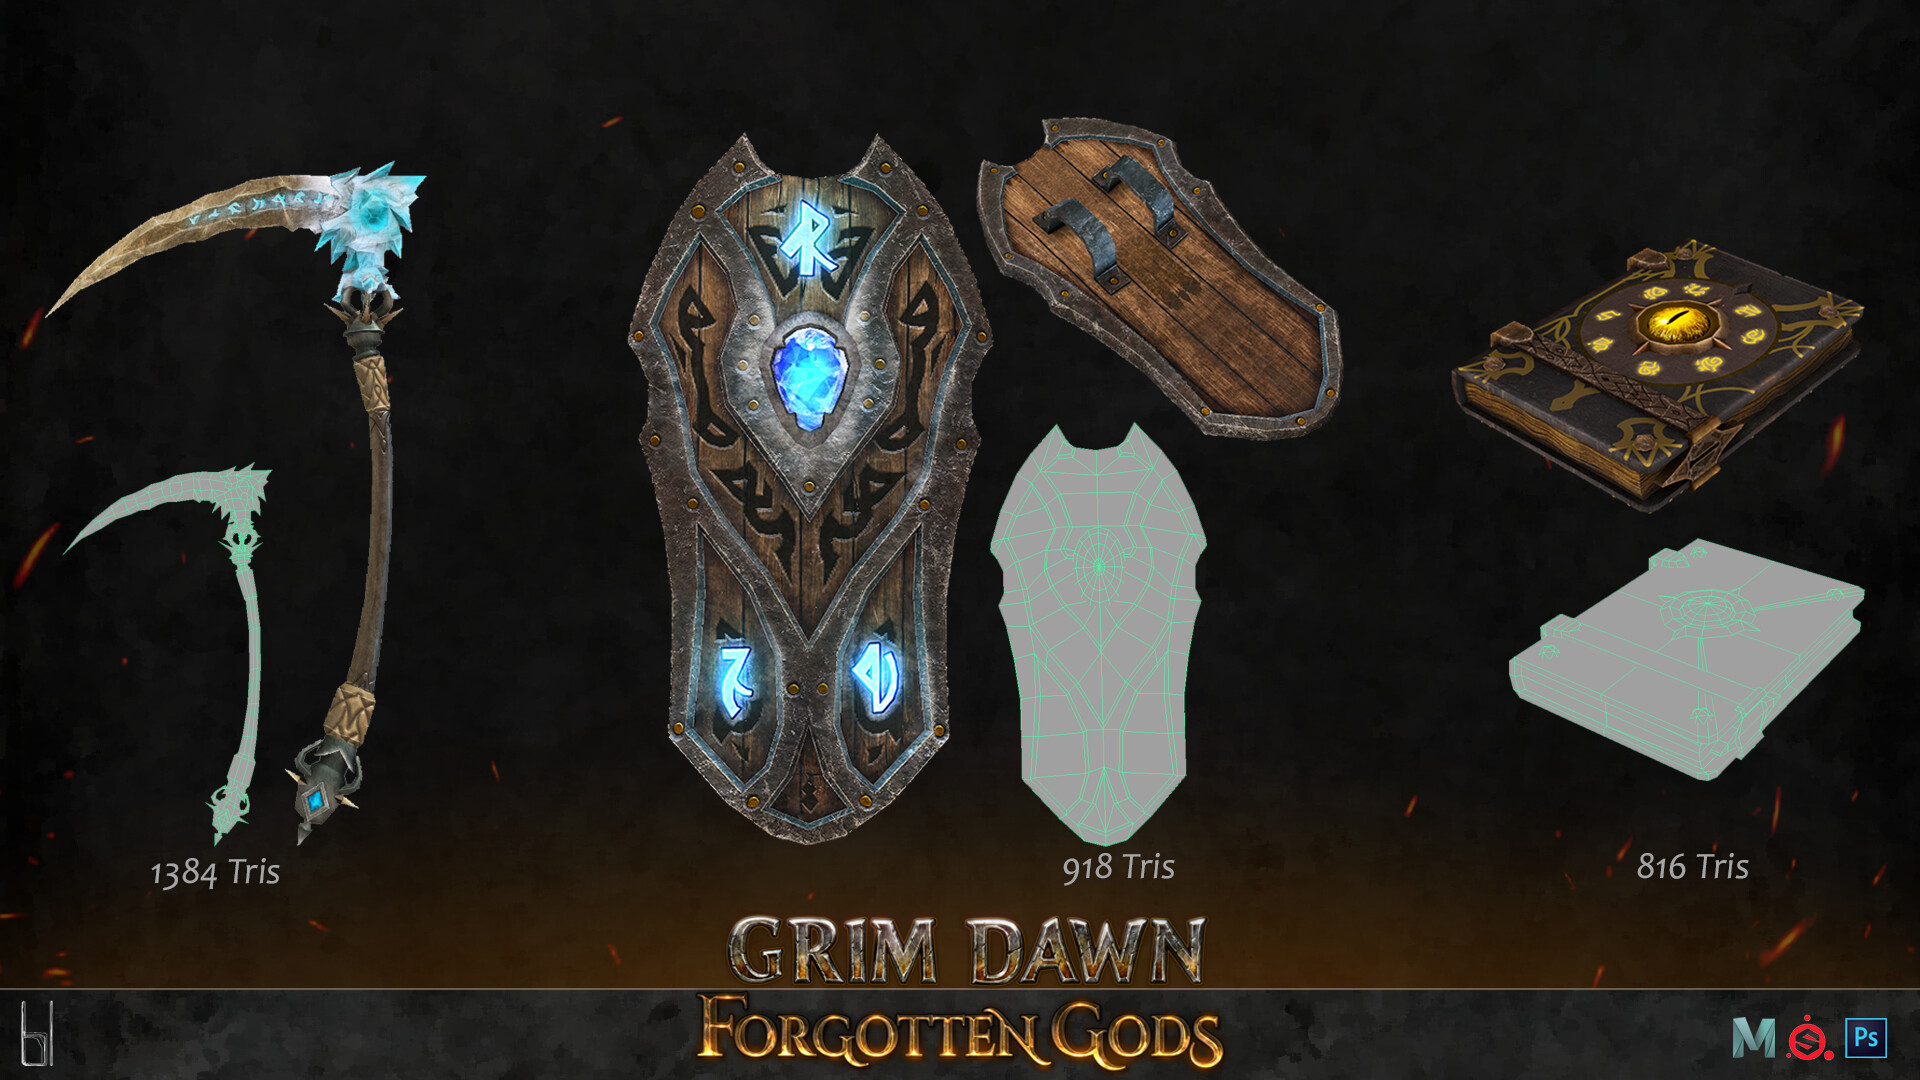 ArtStation - Grim Dawn - Forgotten Gods Expansion, Benoit